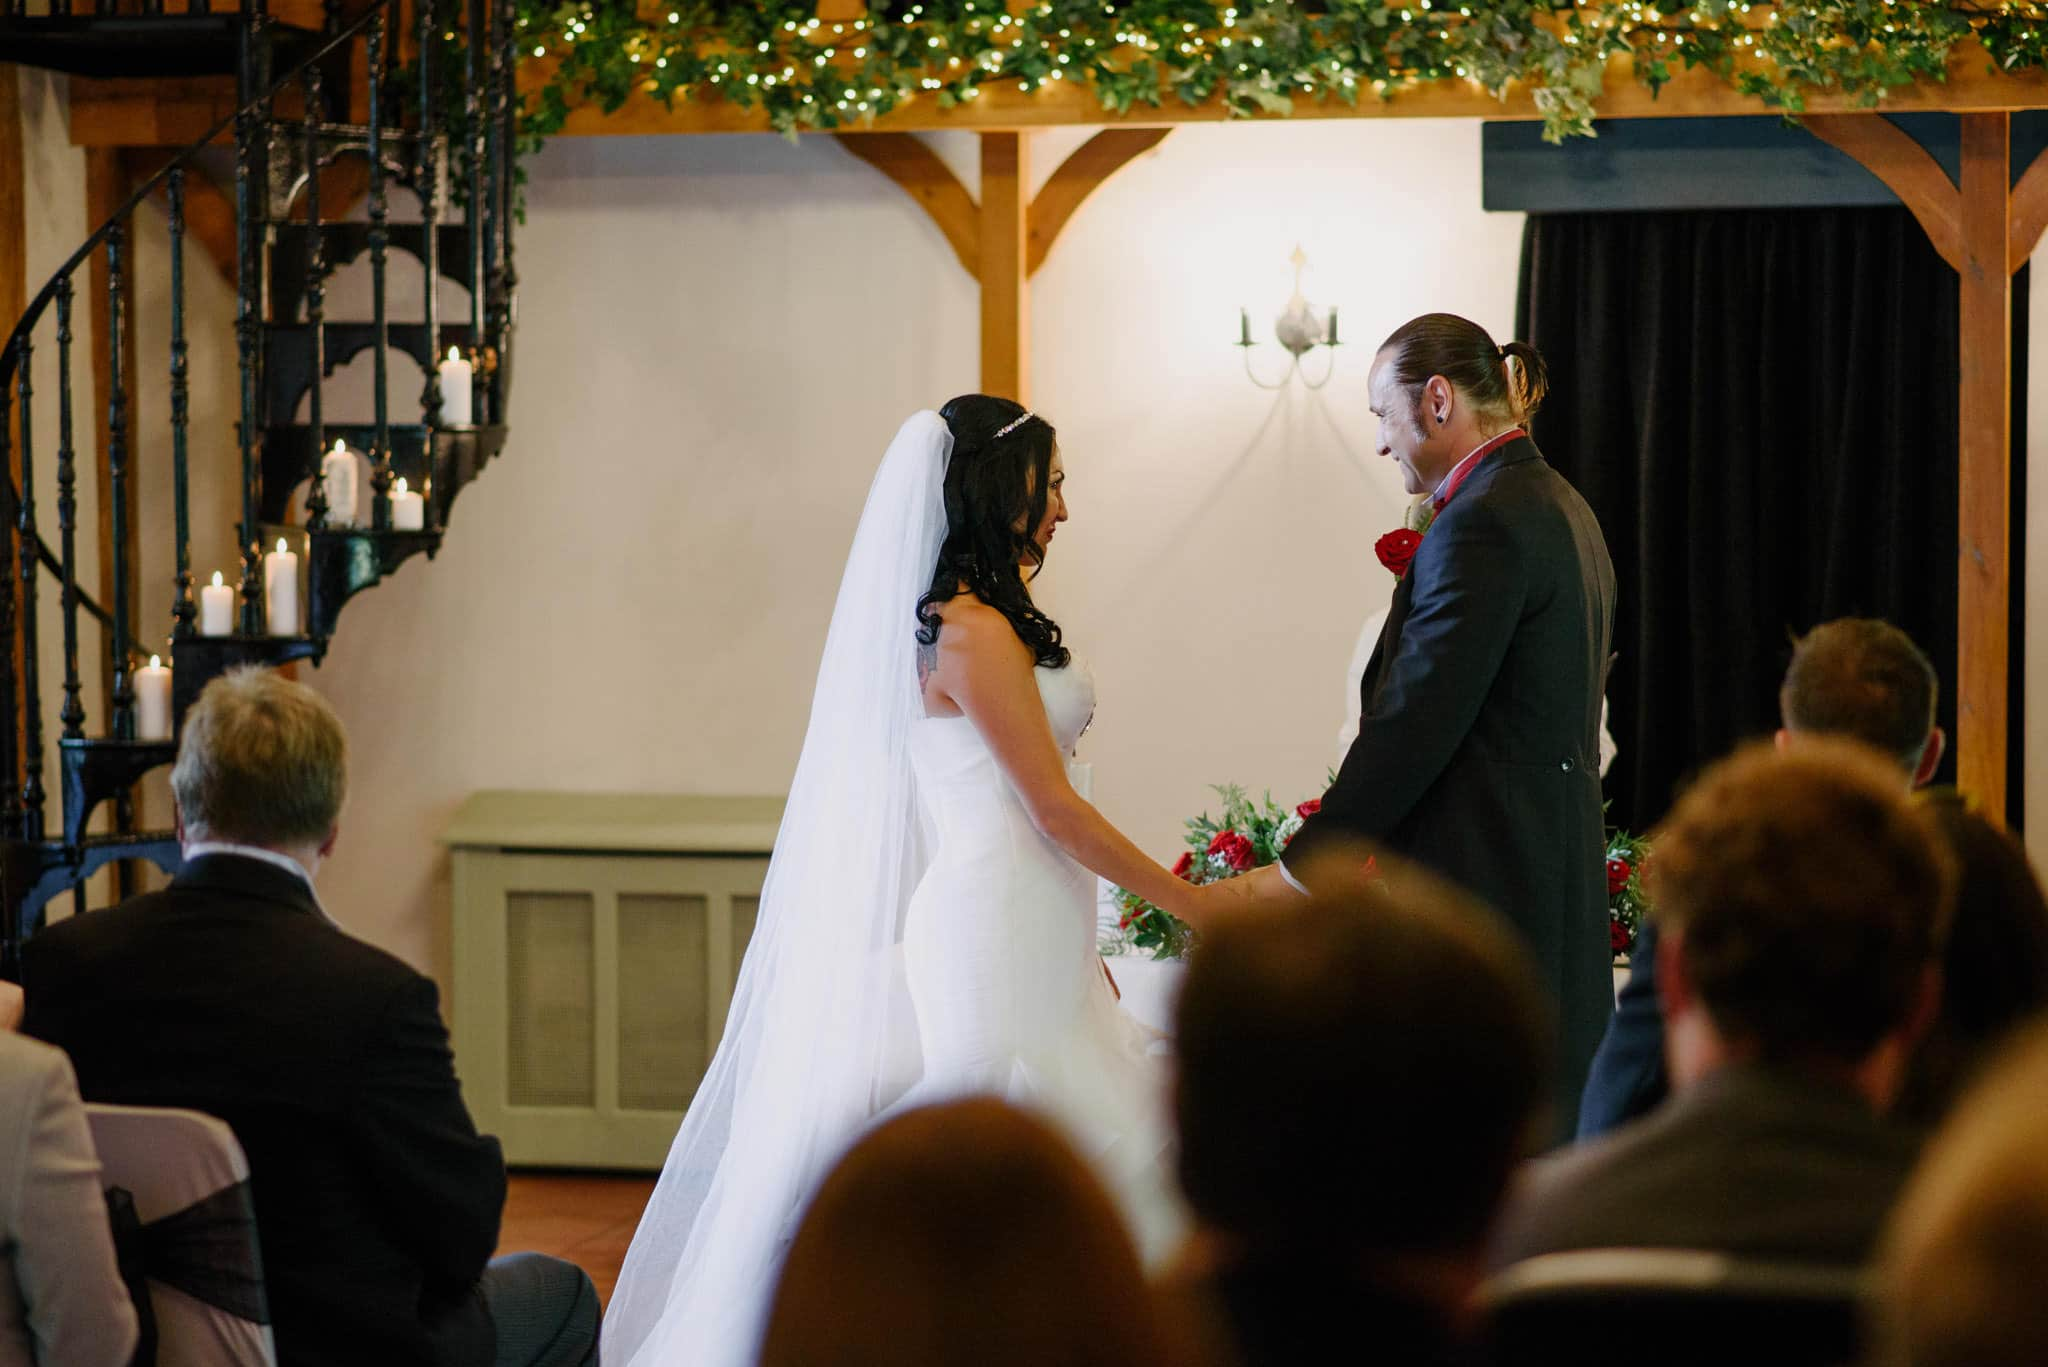 Caroline & Gus - Second Shooting an Essex Wedding 8